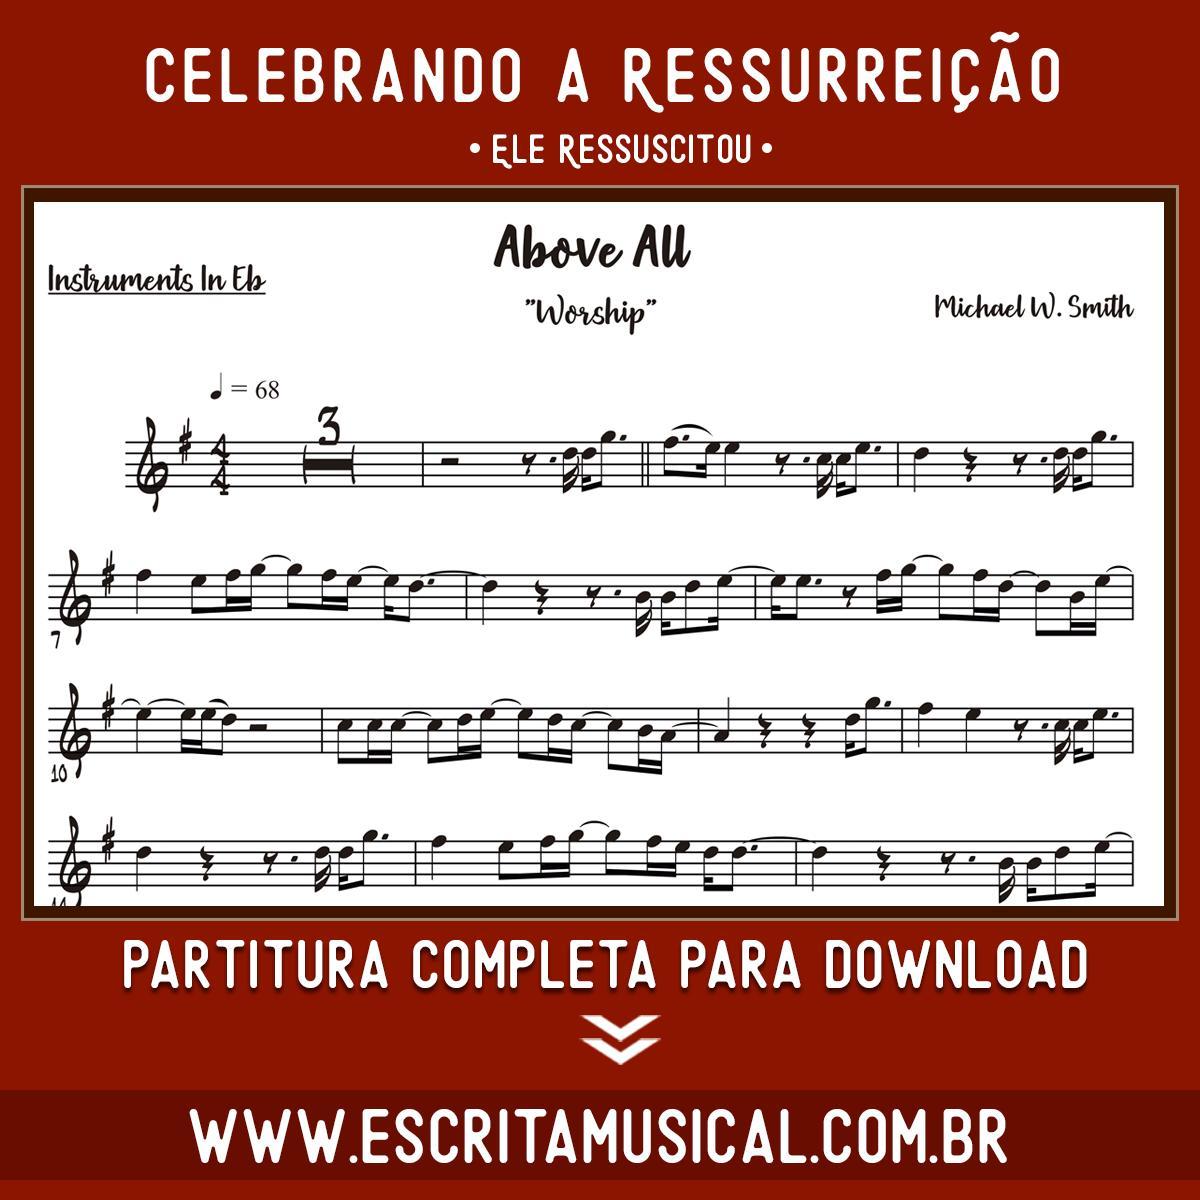 QUE GRATUITO MUSICA JESUS DOWNLOAD GETSEMANI NO MEU FOI OROU